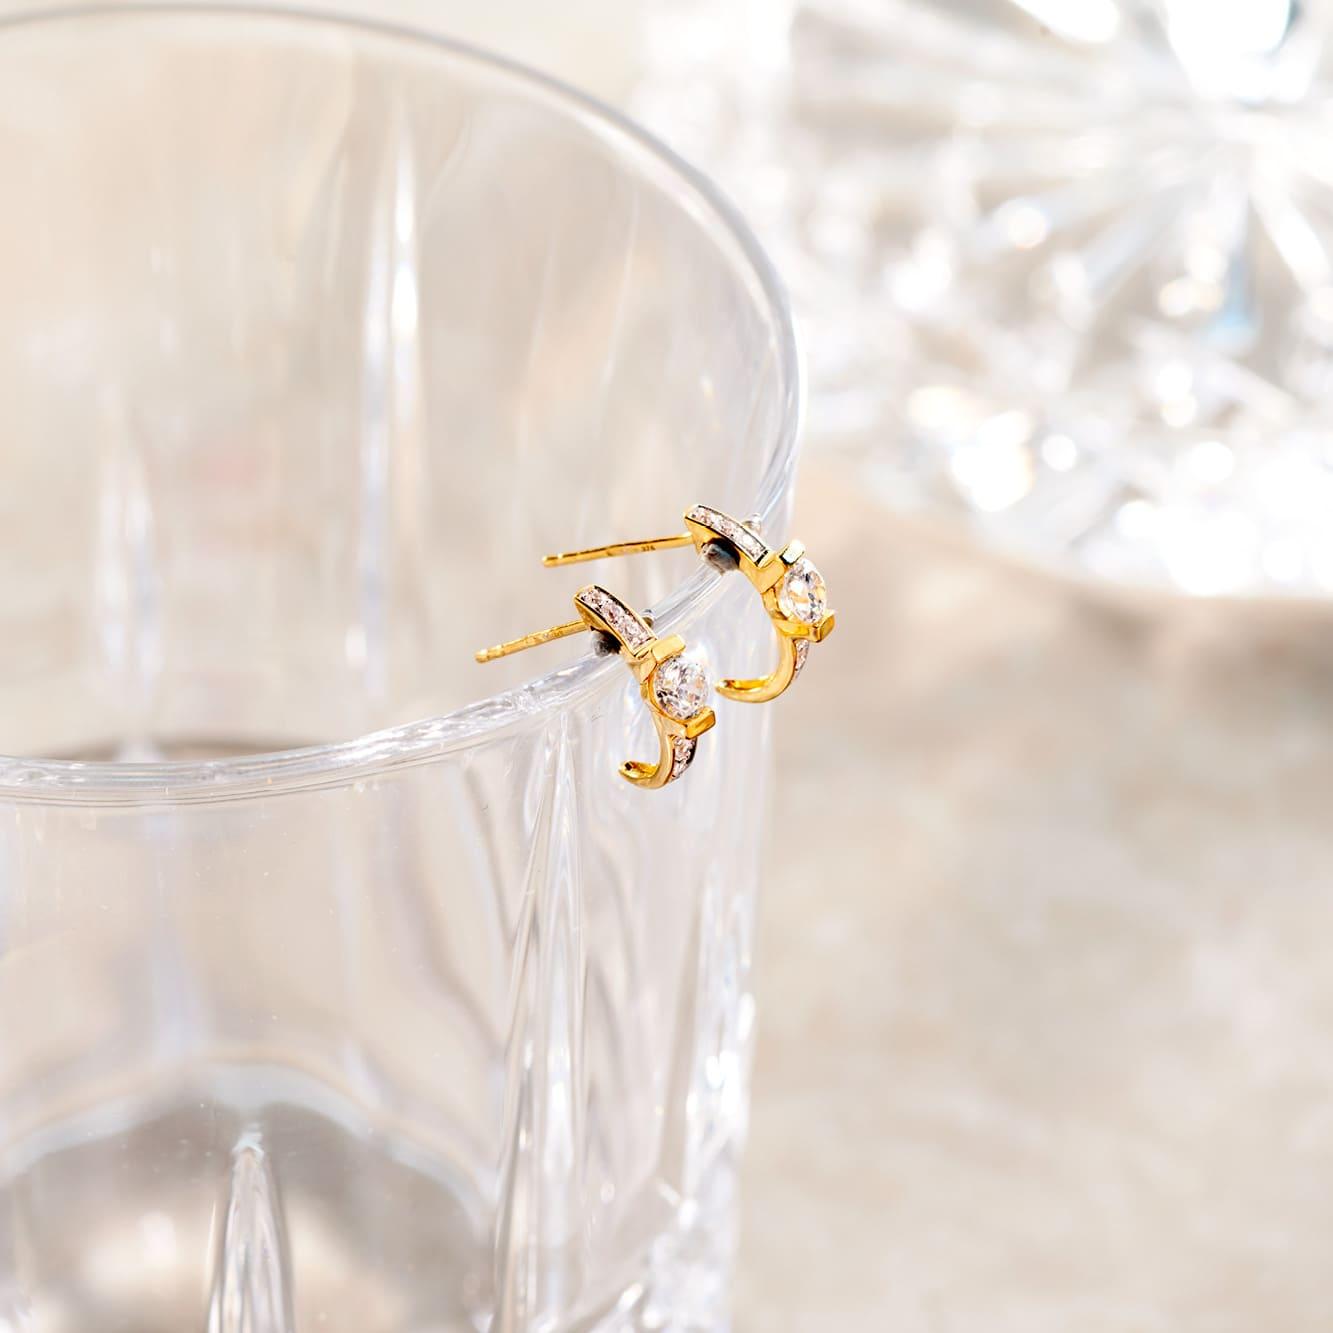 Damen Steckcreolen Gold 375 Zirkonia